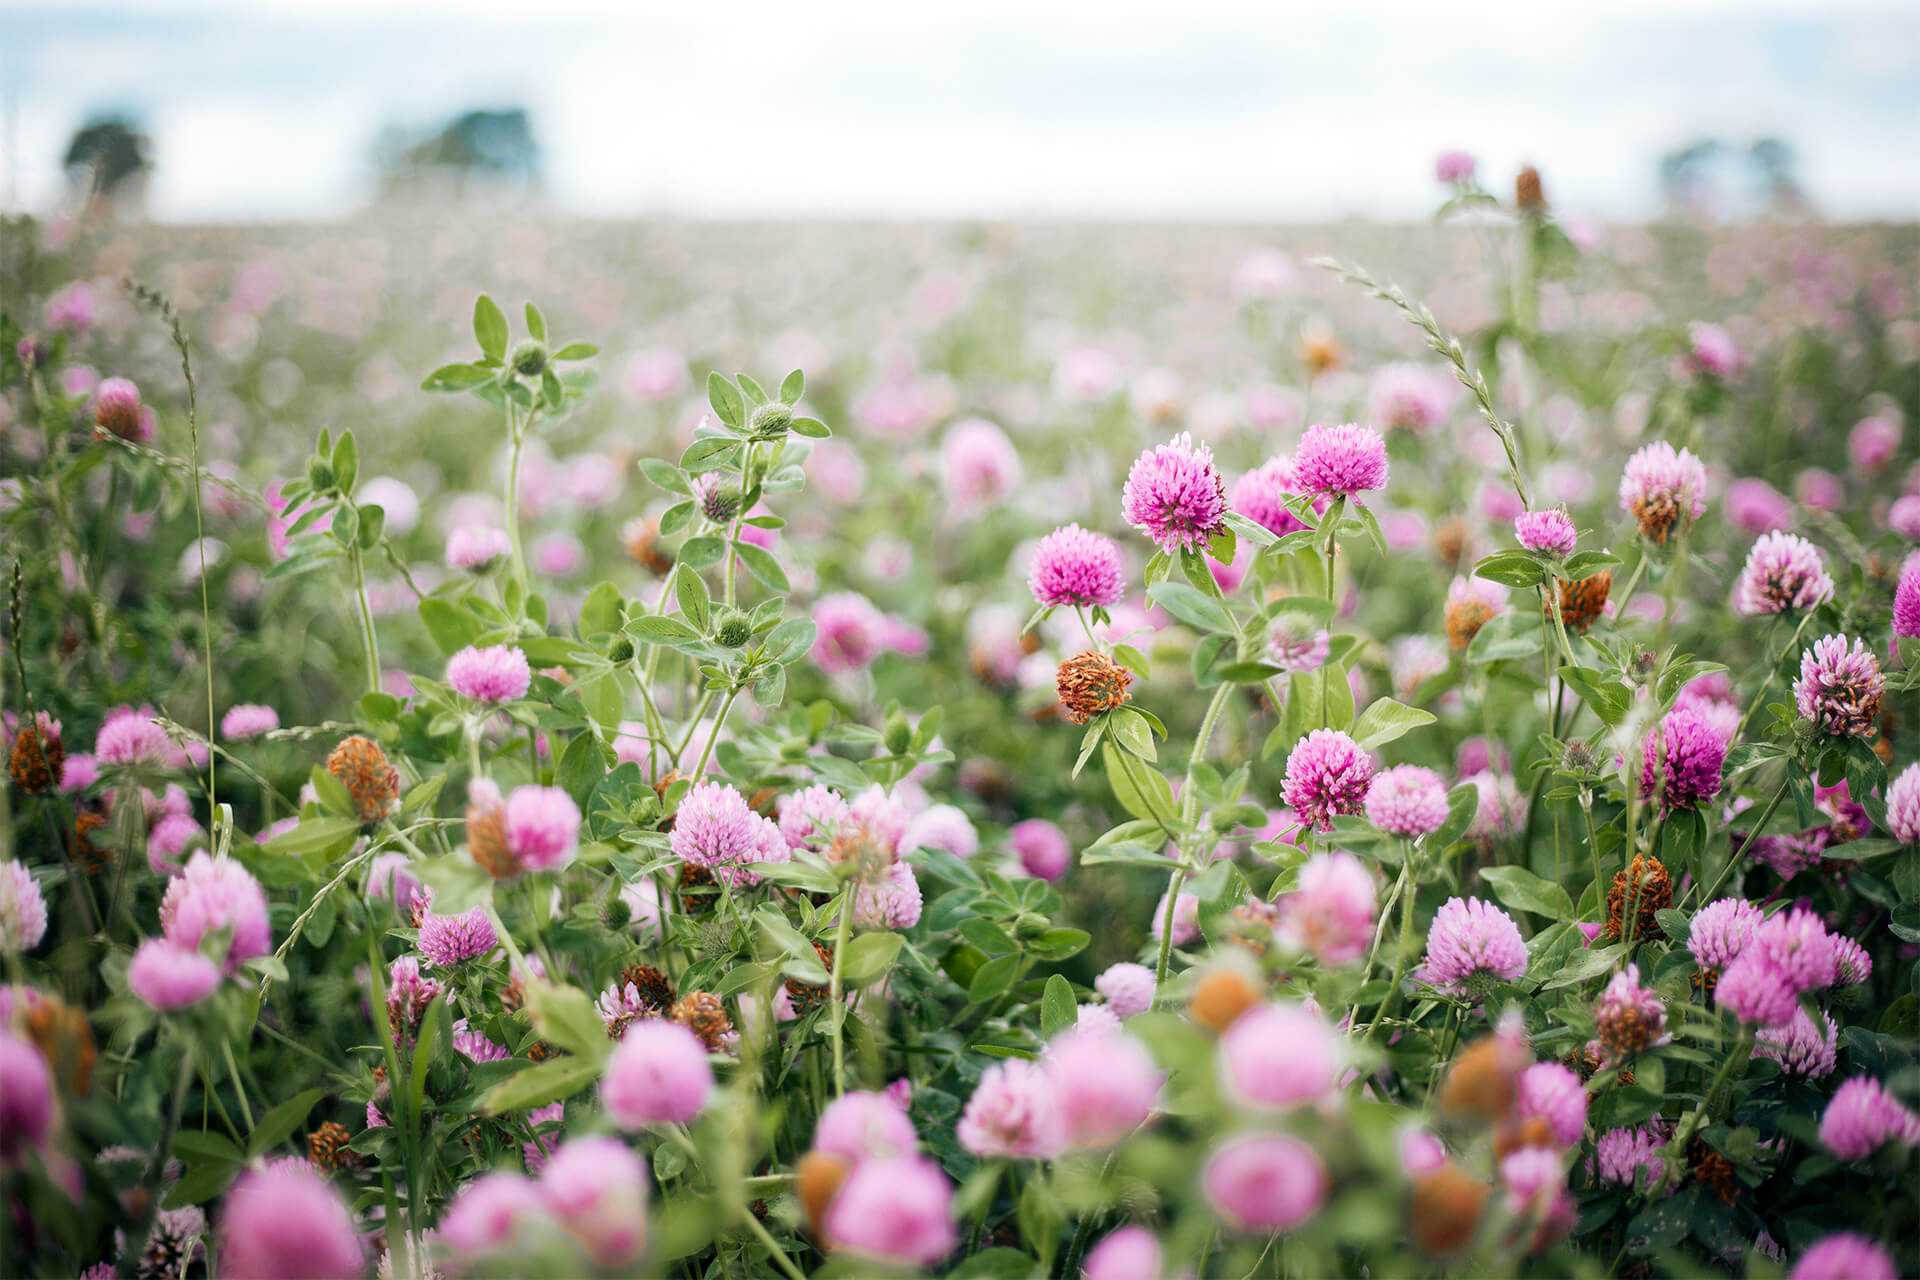 Daylesford, Organic, Farm, Field, Green, Grass, Sheep, Landscape, Summer, Photography, Agency, Gloucestershire, WeAreShuffle